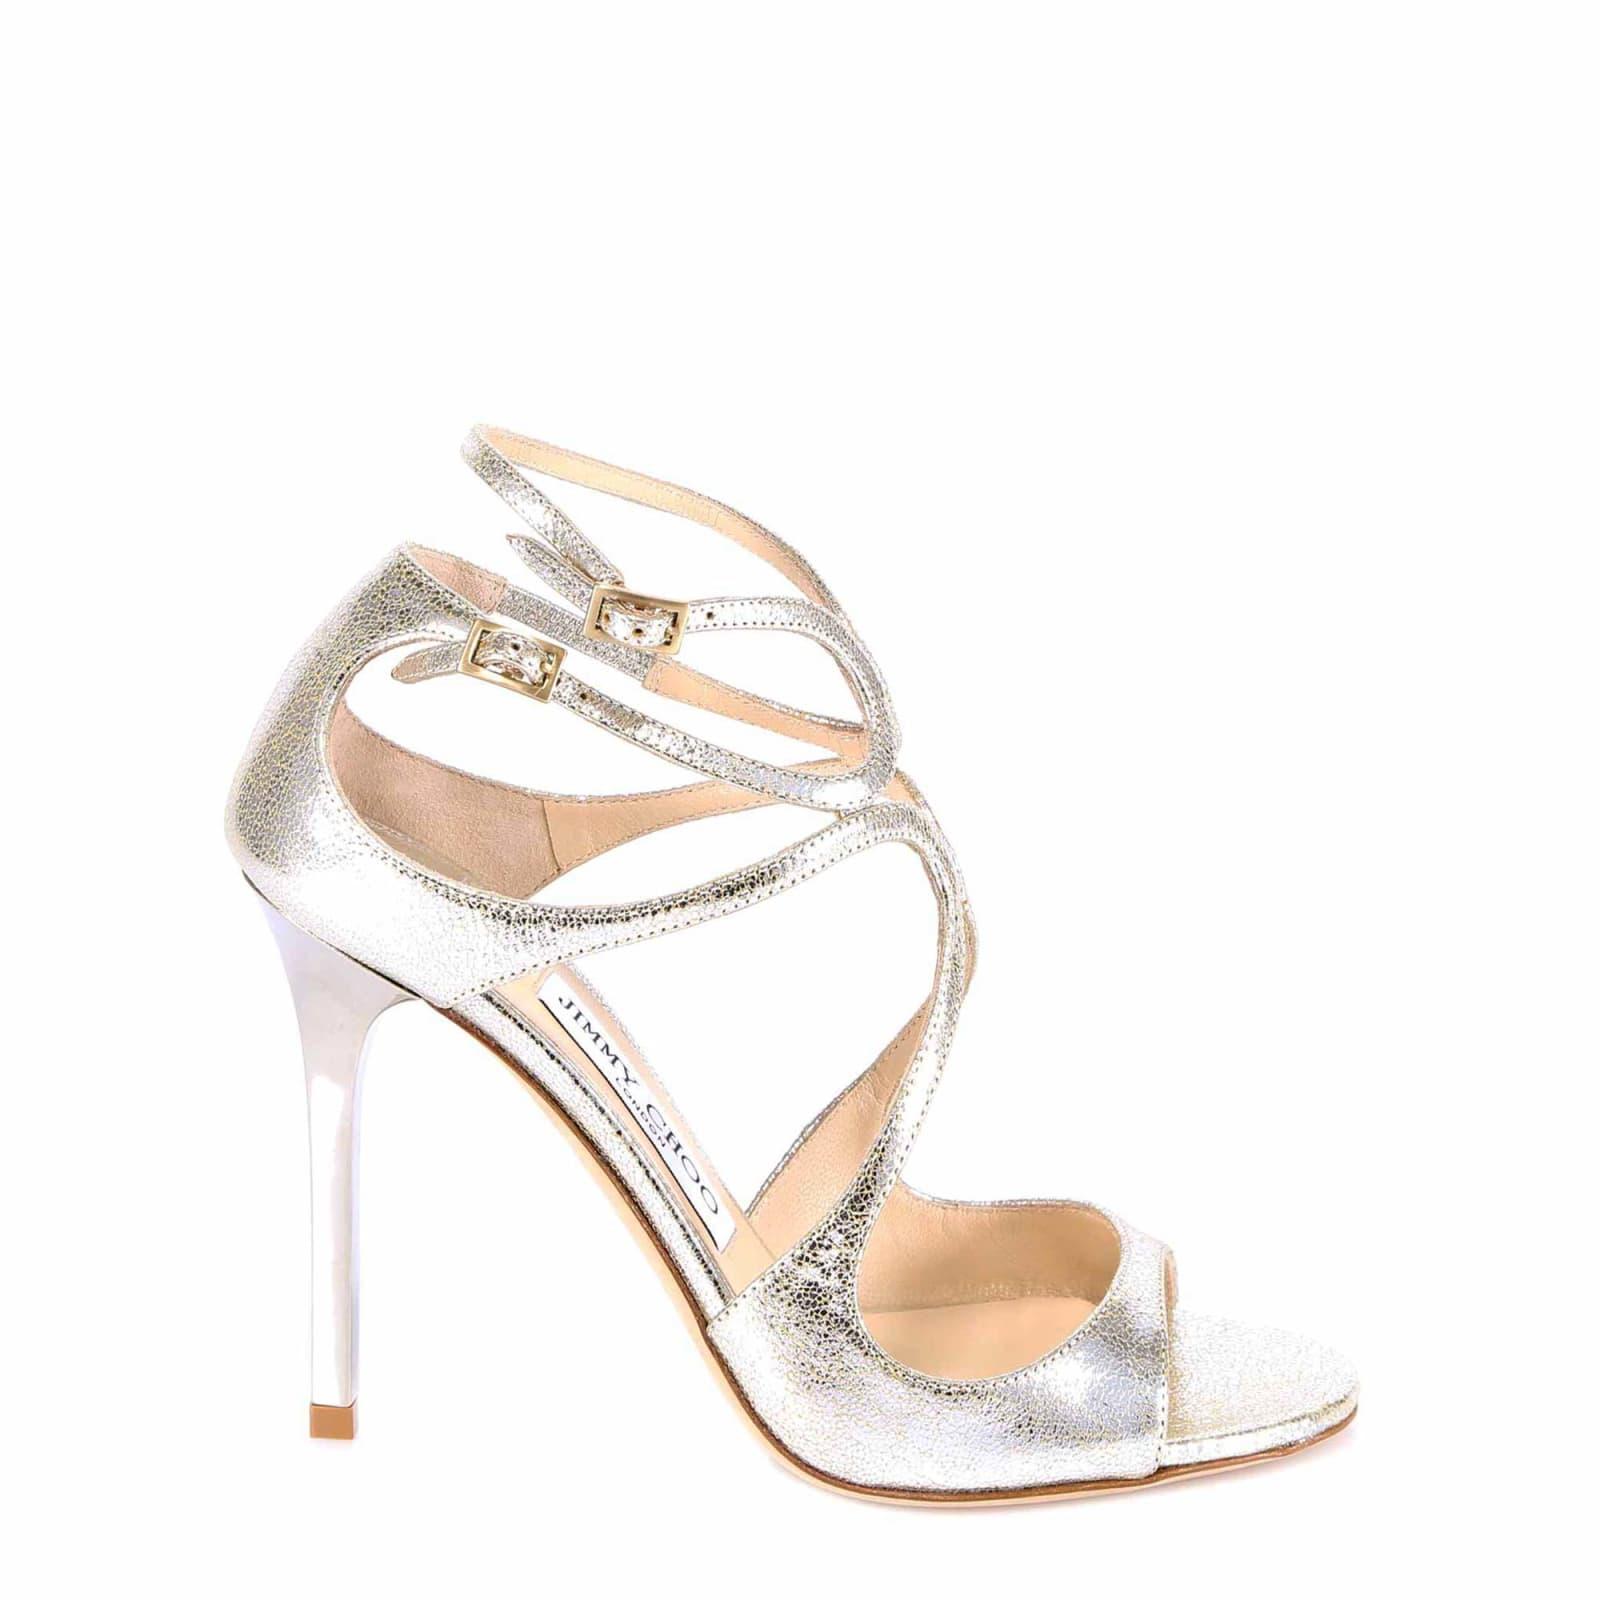 Jimmy Choo Jimmy Choo Sandals - Silver